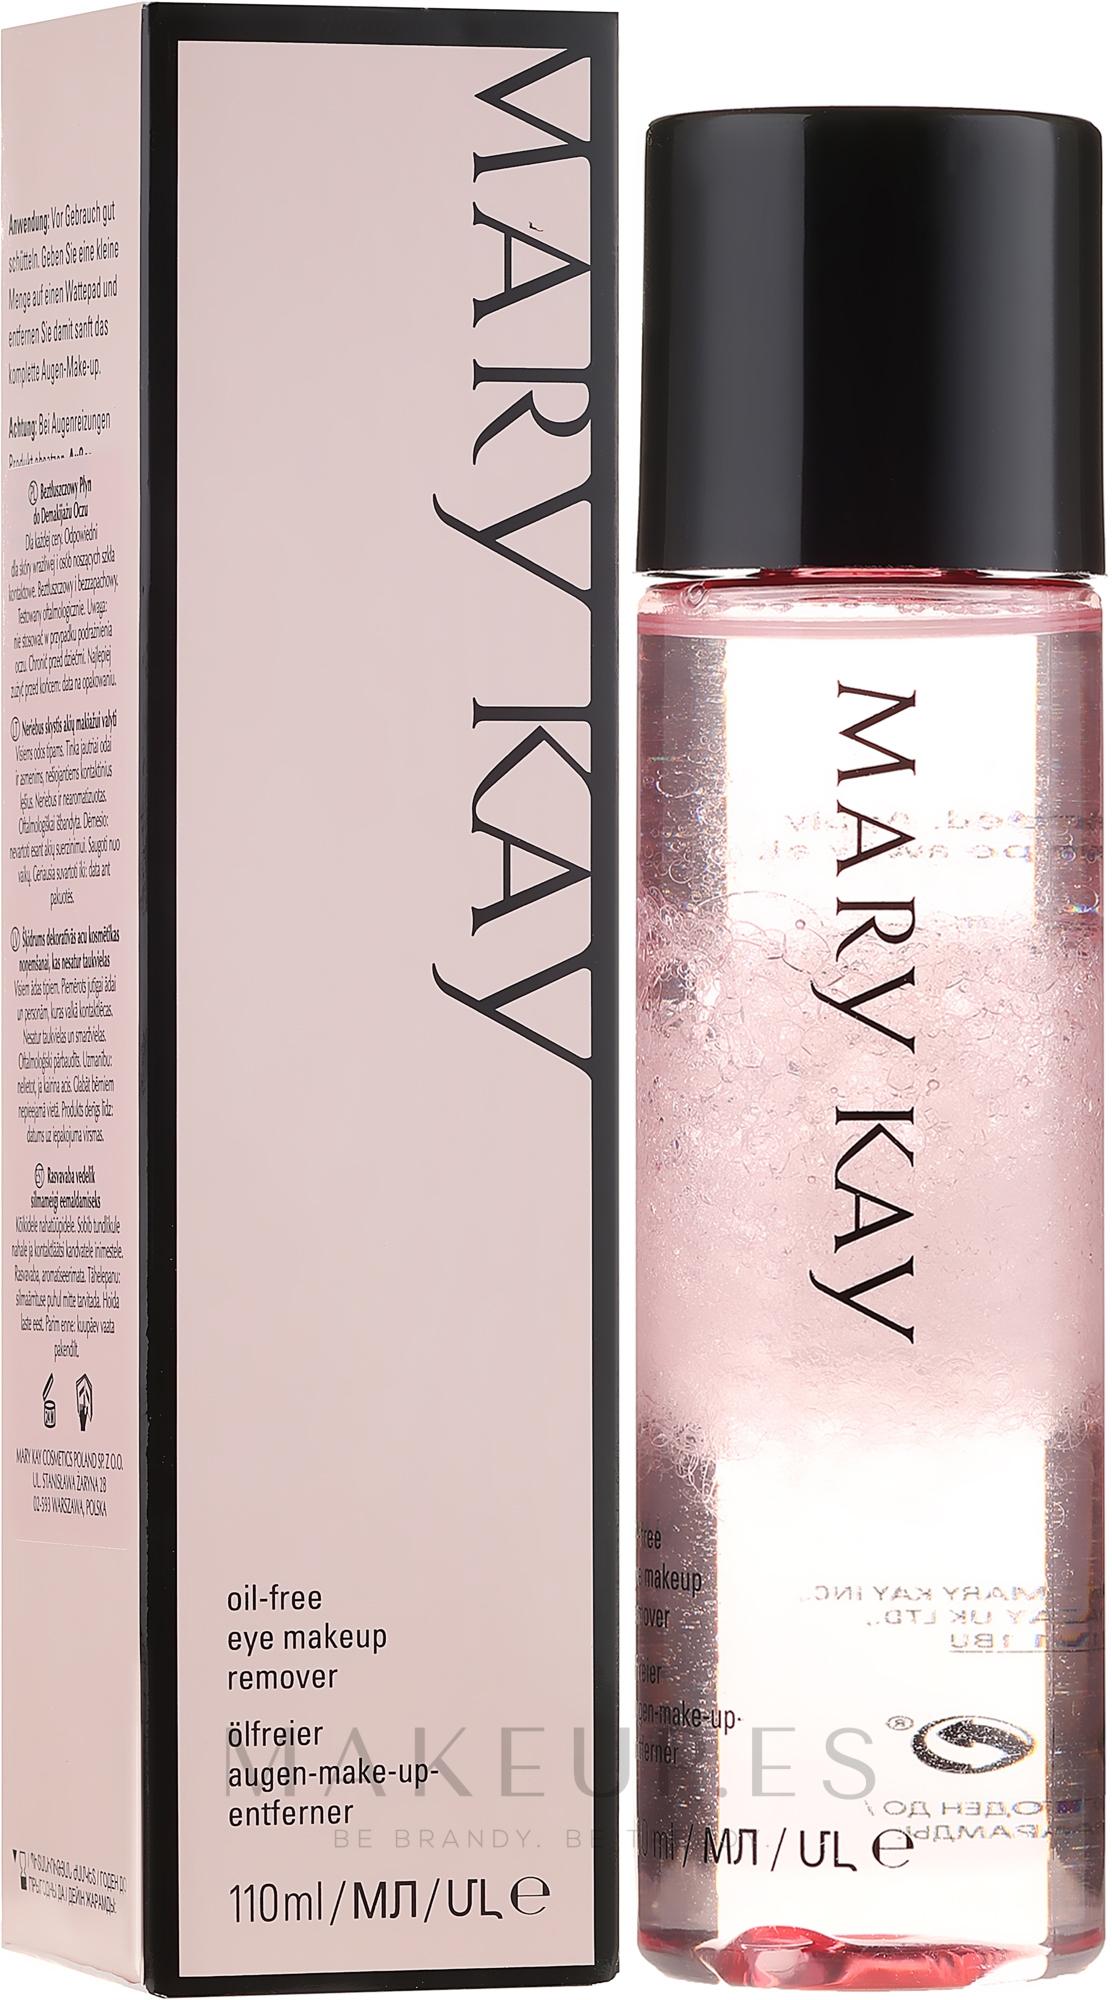 Desmaquillante de ojos suave hipoalergénico - Mary Kay TimeWise Oil Free Eye Make-up Remover — imagen 110 ml